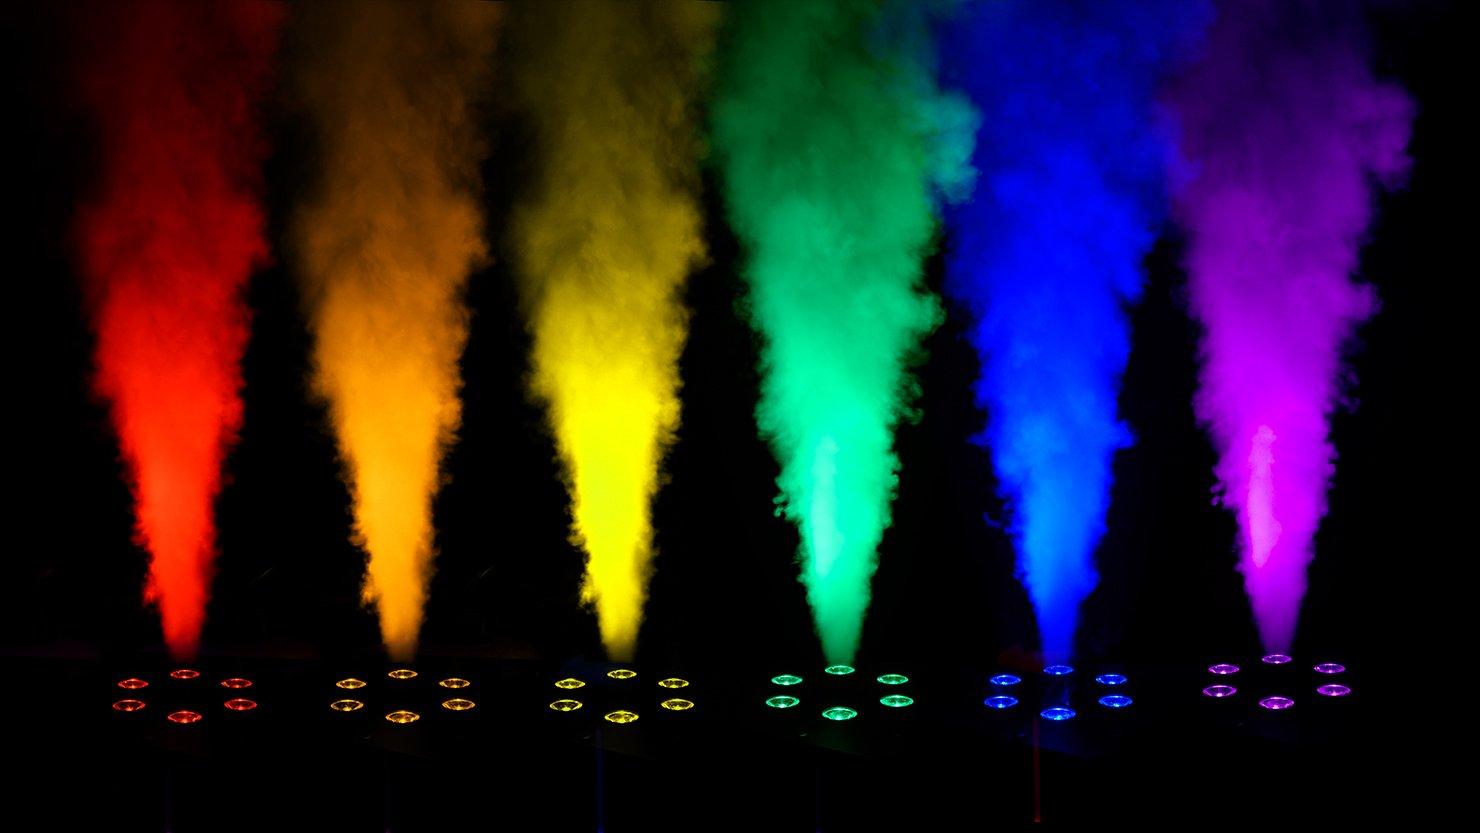 CHAUVET DJ Geyser T6 (GEYSERT6) Chauvet Lighting